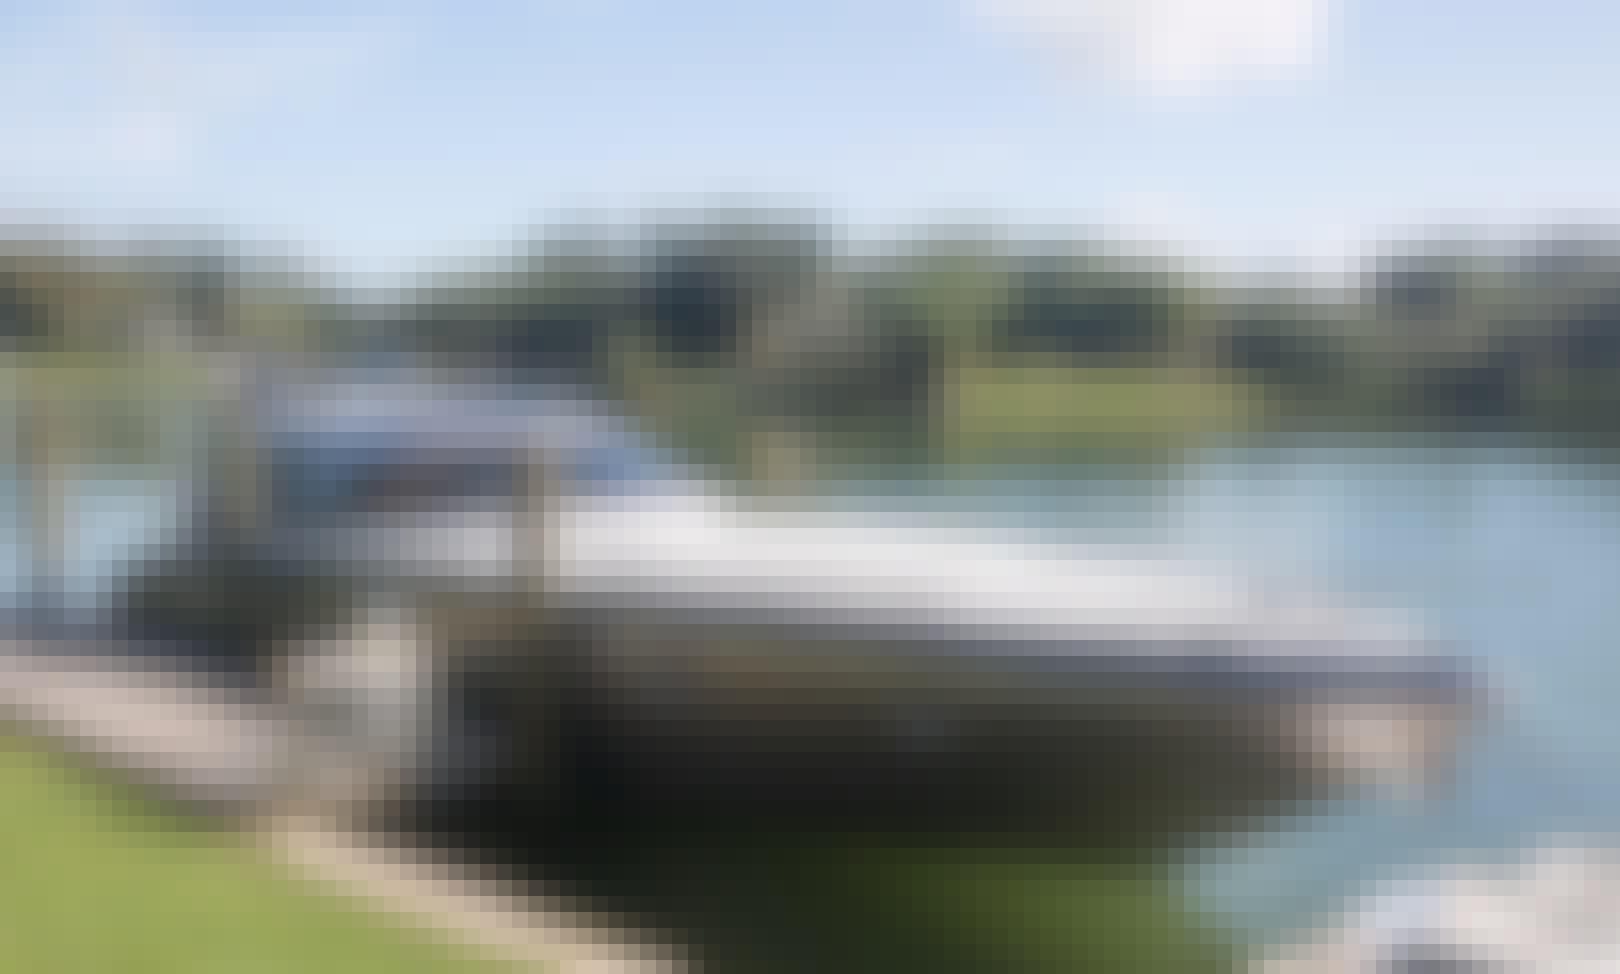 BAIA Italian Cruising Motor Yacht in Miami. Enjoy Luxury in Miami Florida!